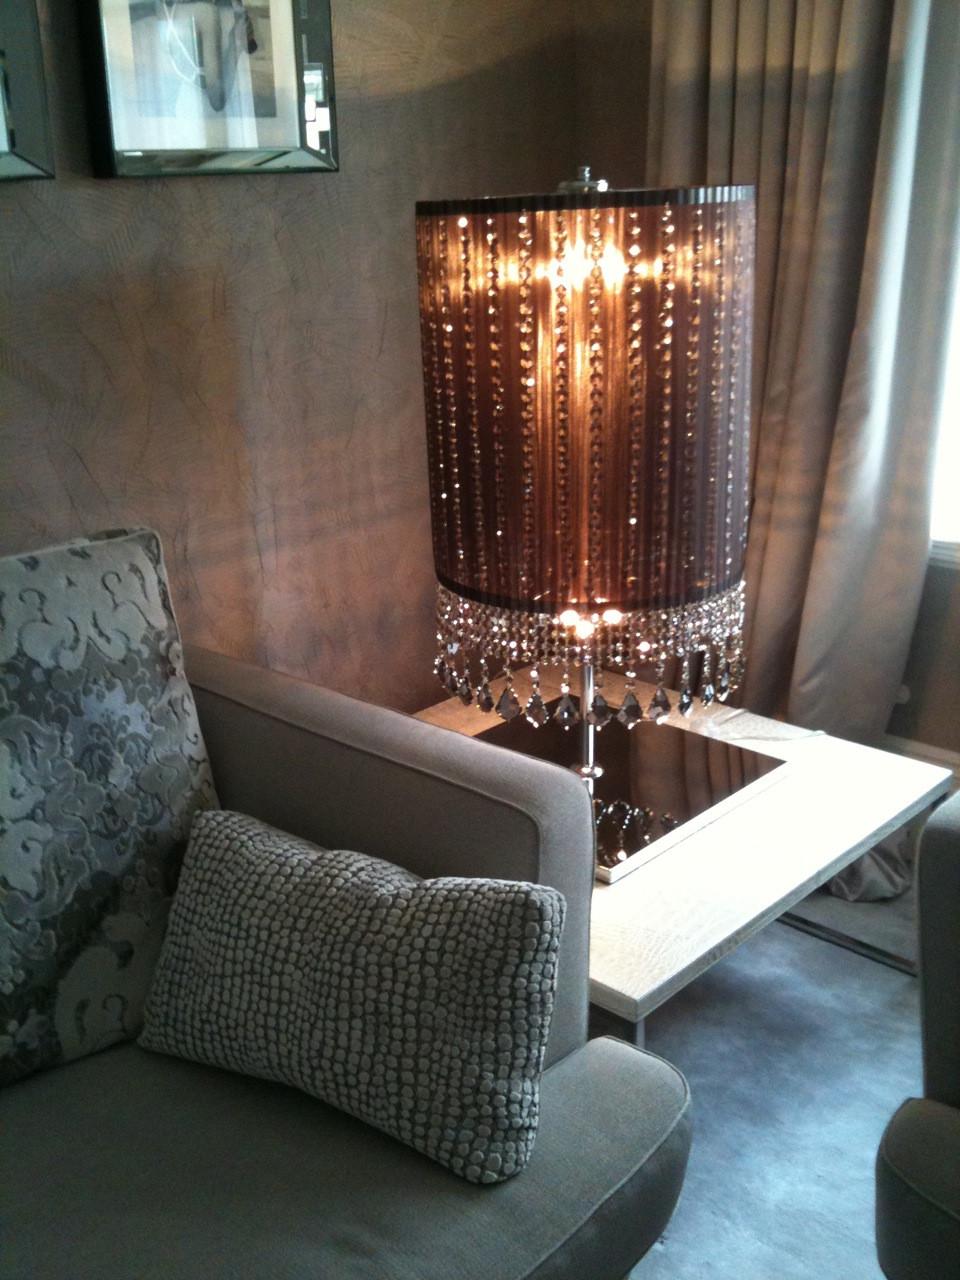 CIRCULAR CARAMEL FLOOR LAMP